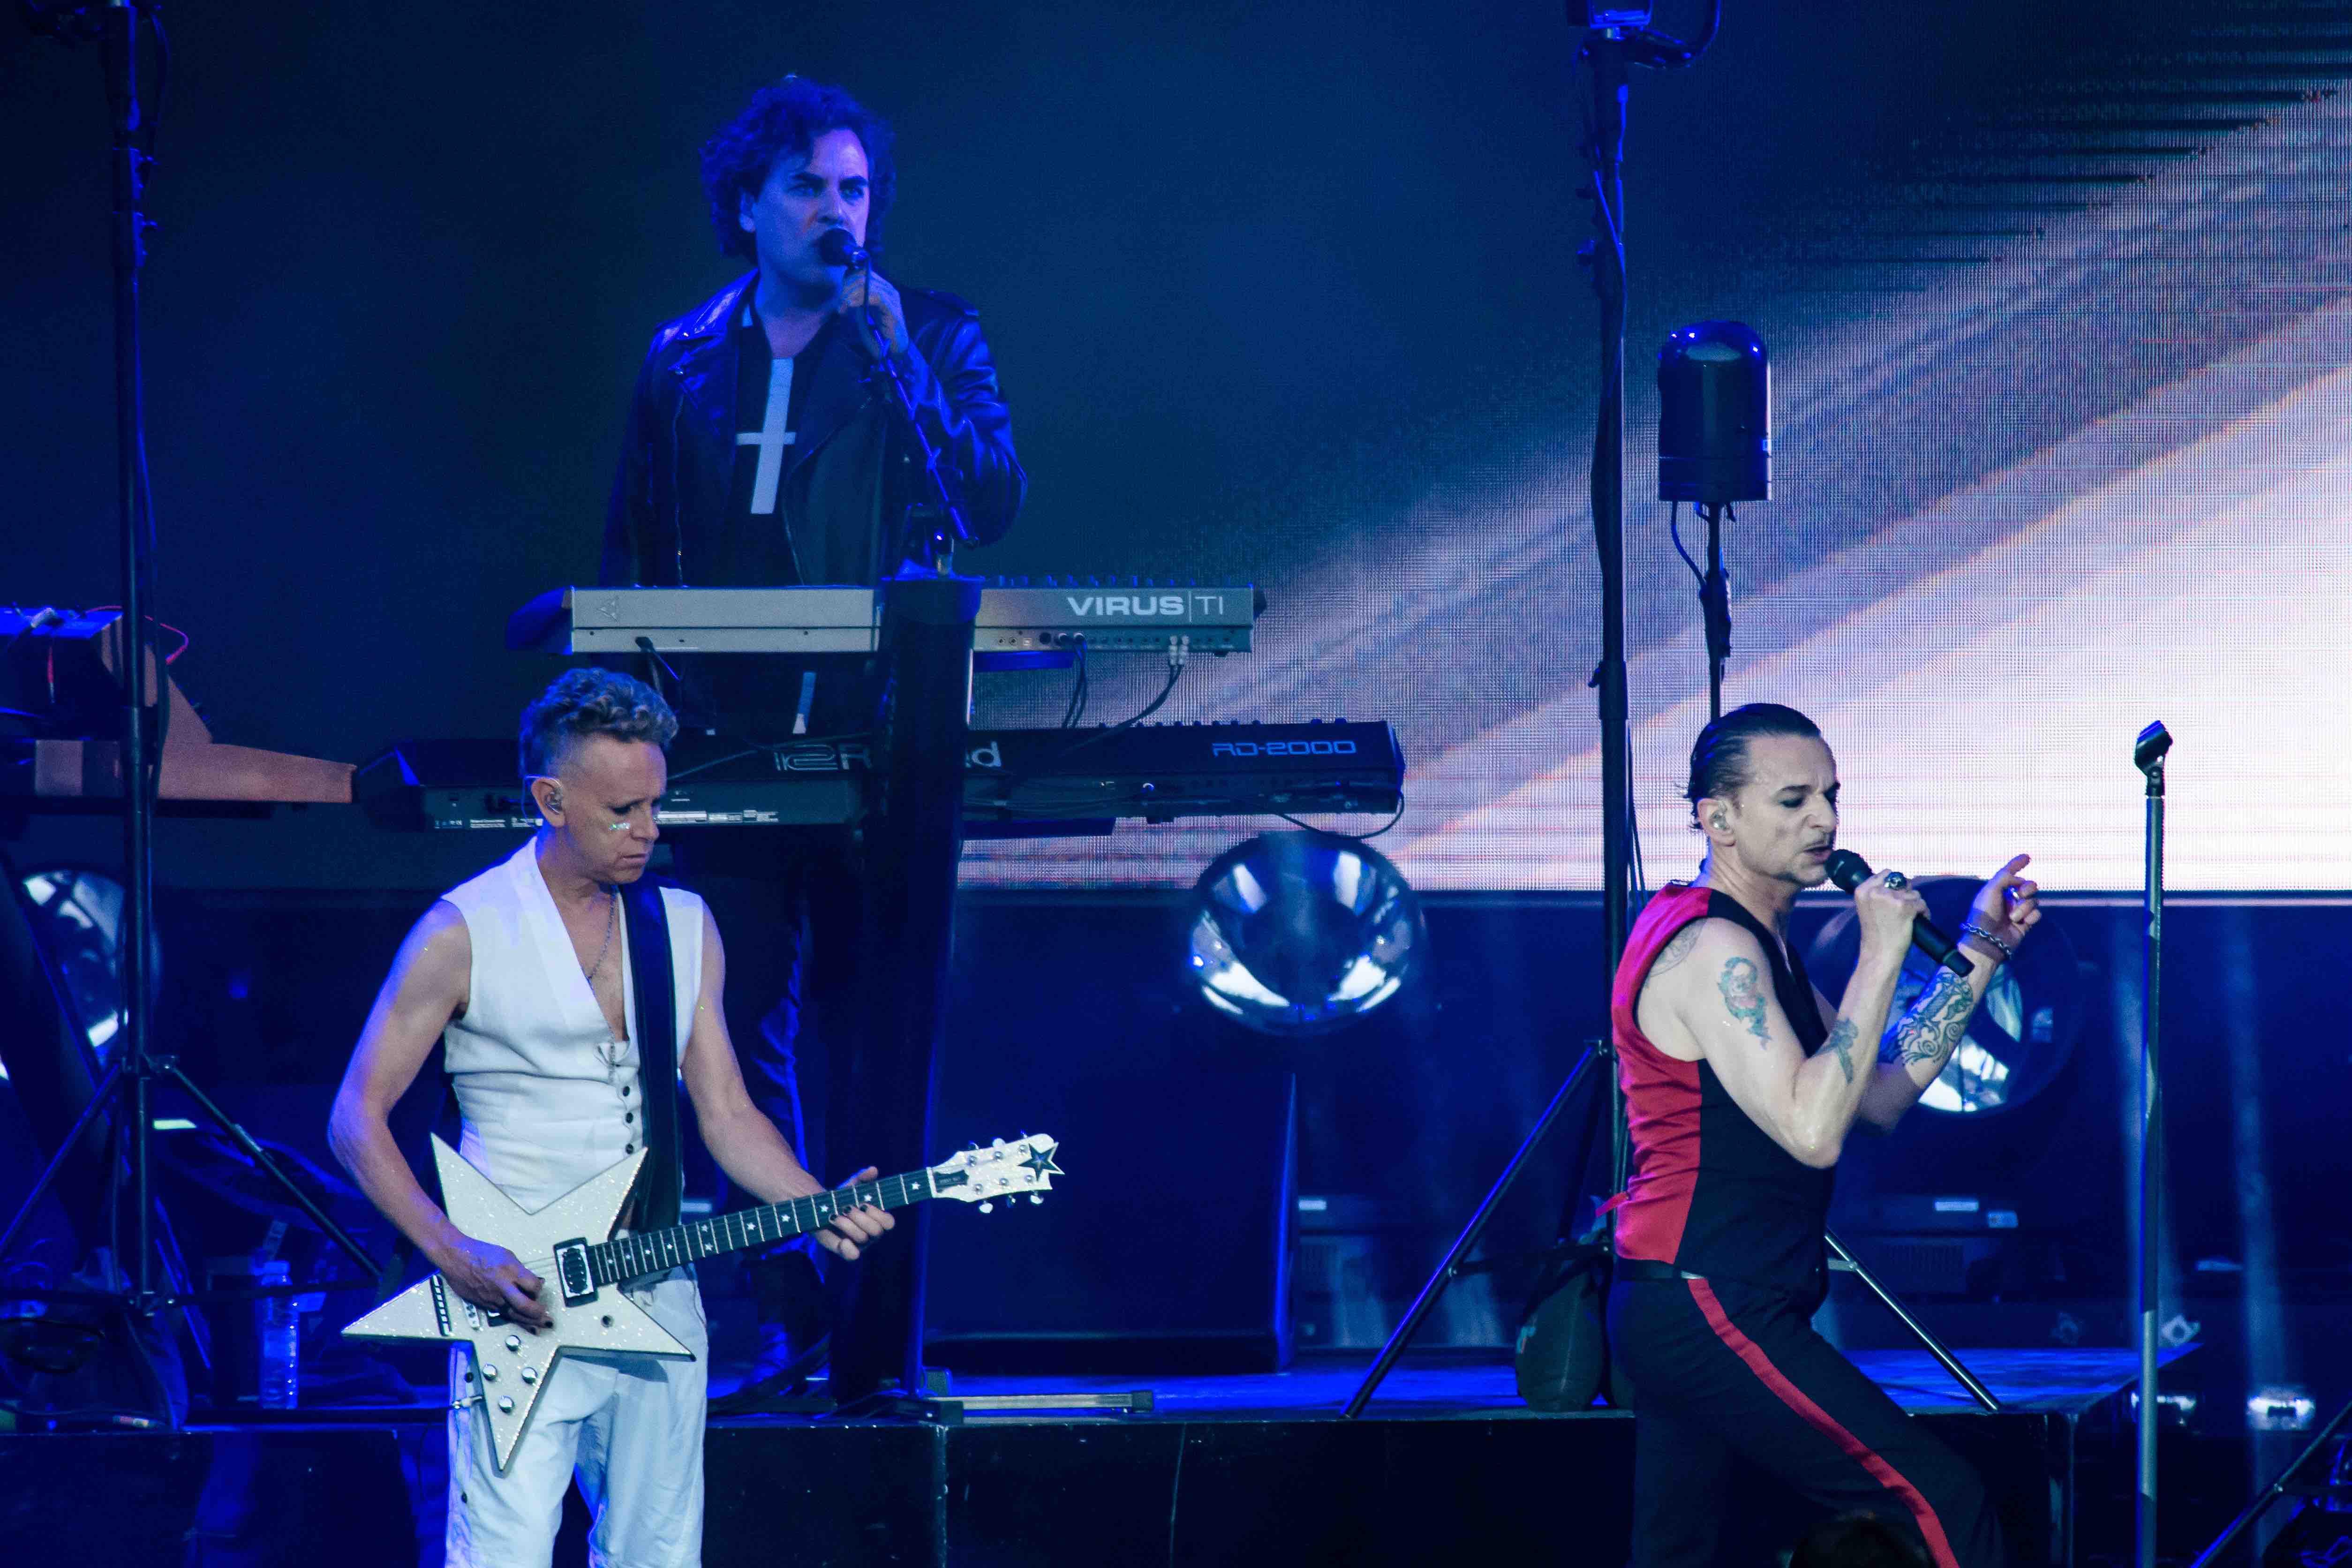 Depeche Mode In Berlin Band Mietet Bahn Im Olympiabad